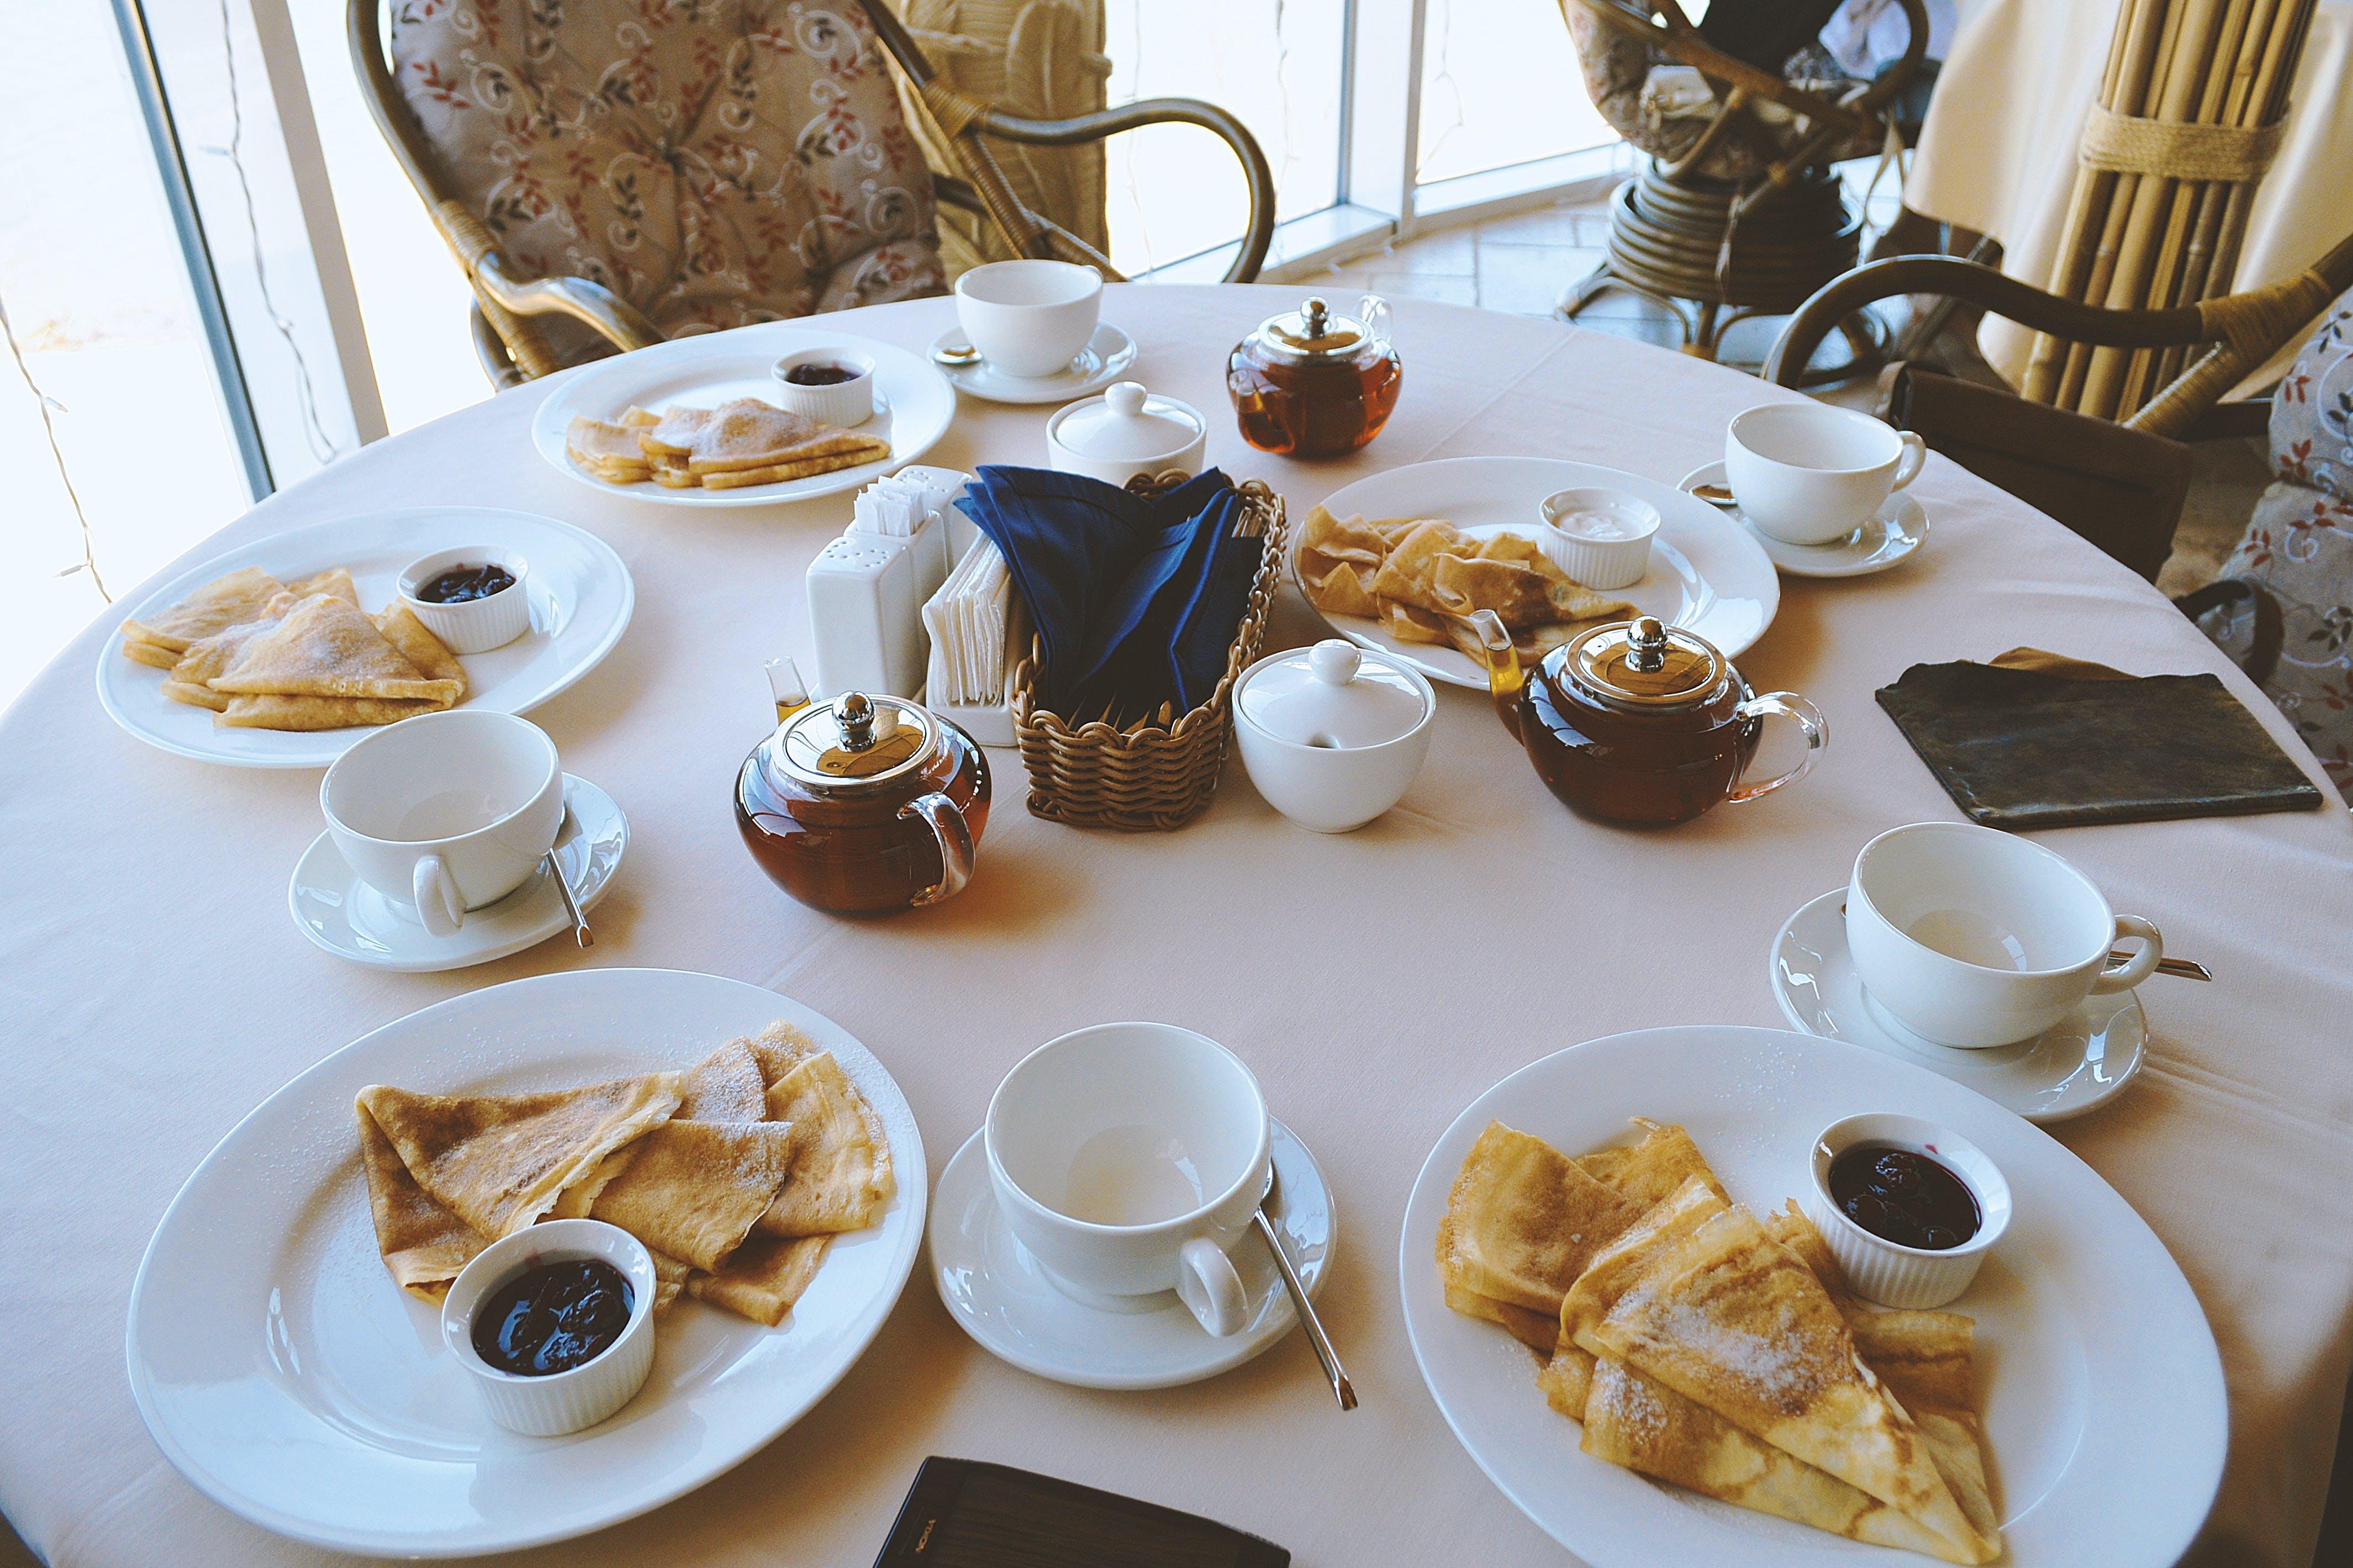 White Ceramic Dinnerware on Table